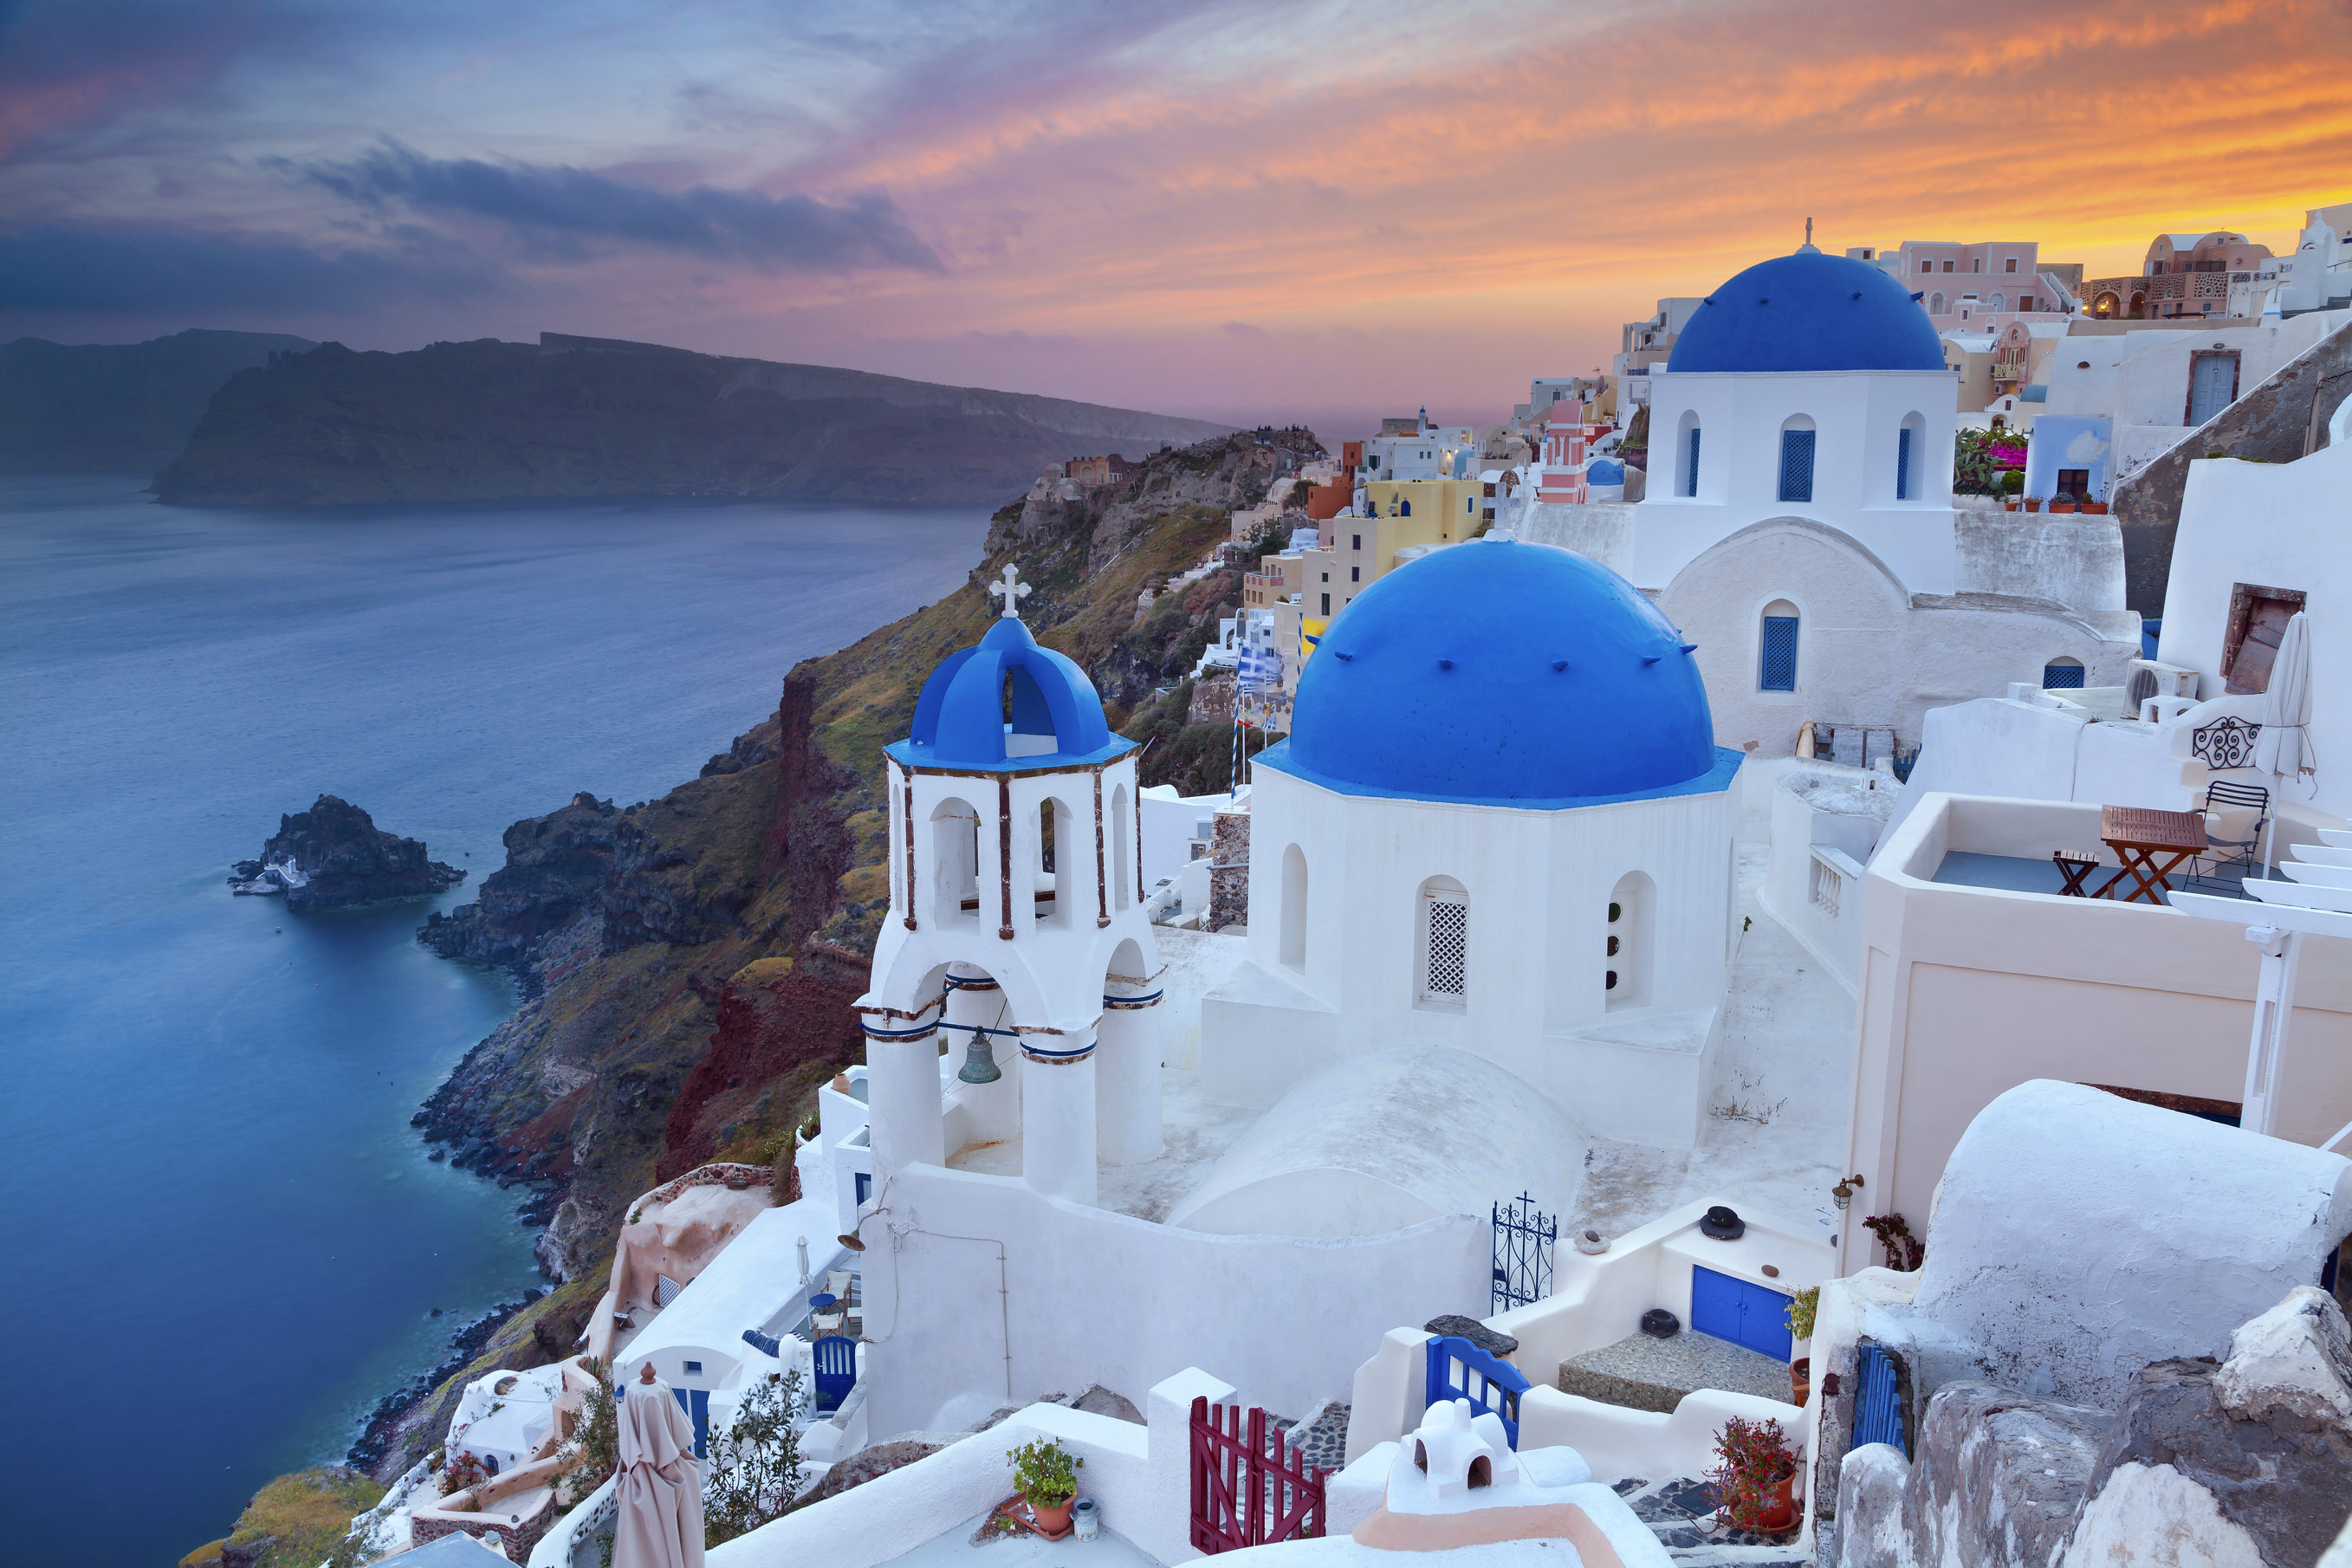 Image of small village Oia, located on beautiful greek island Santorini, during sunset.